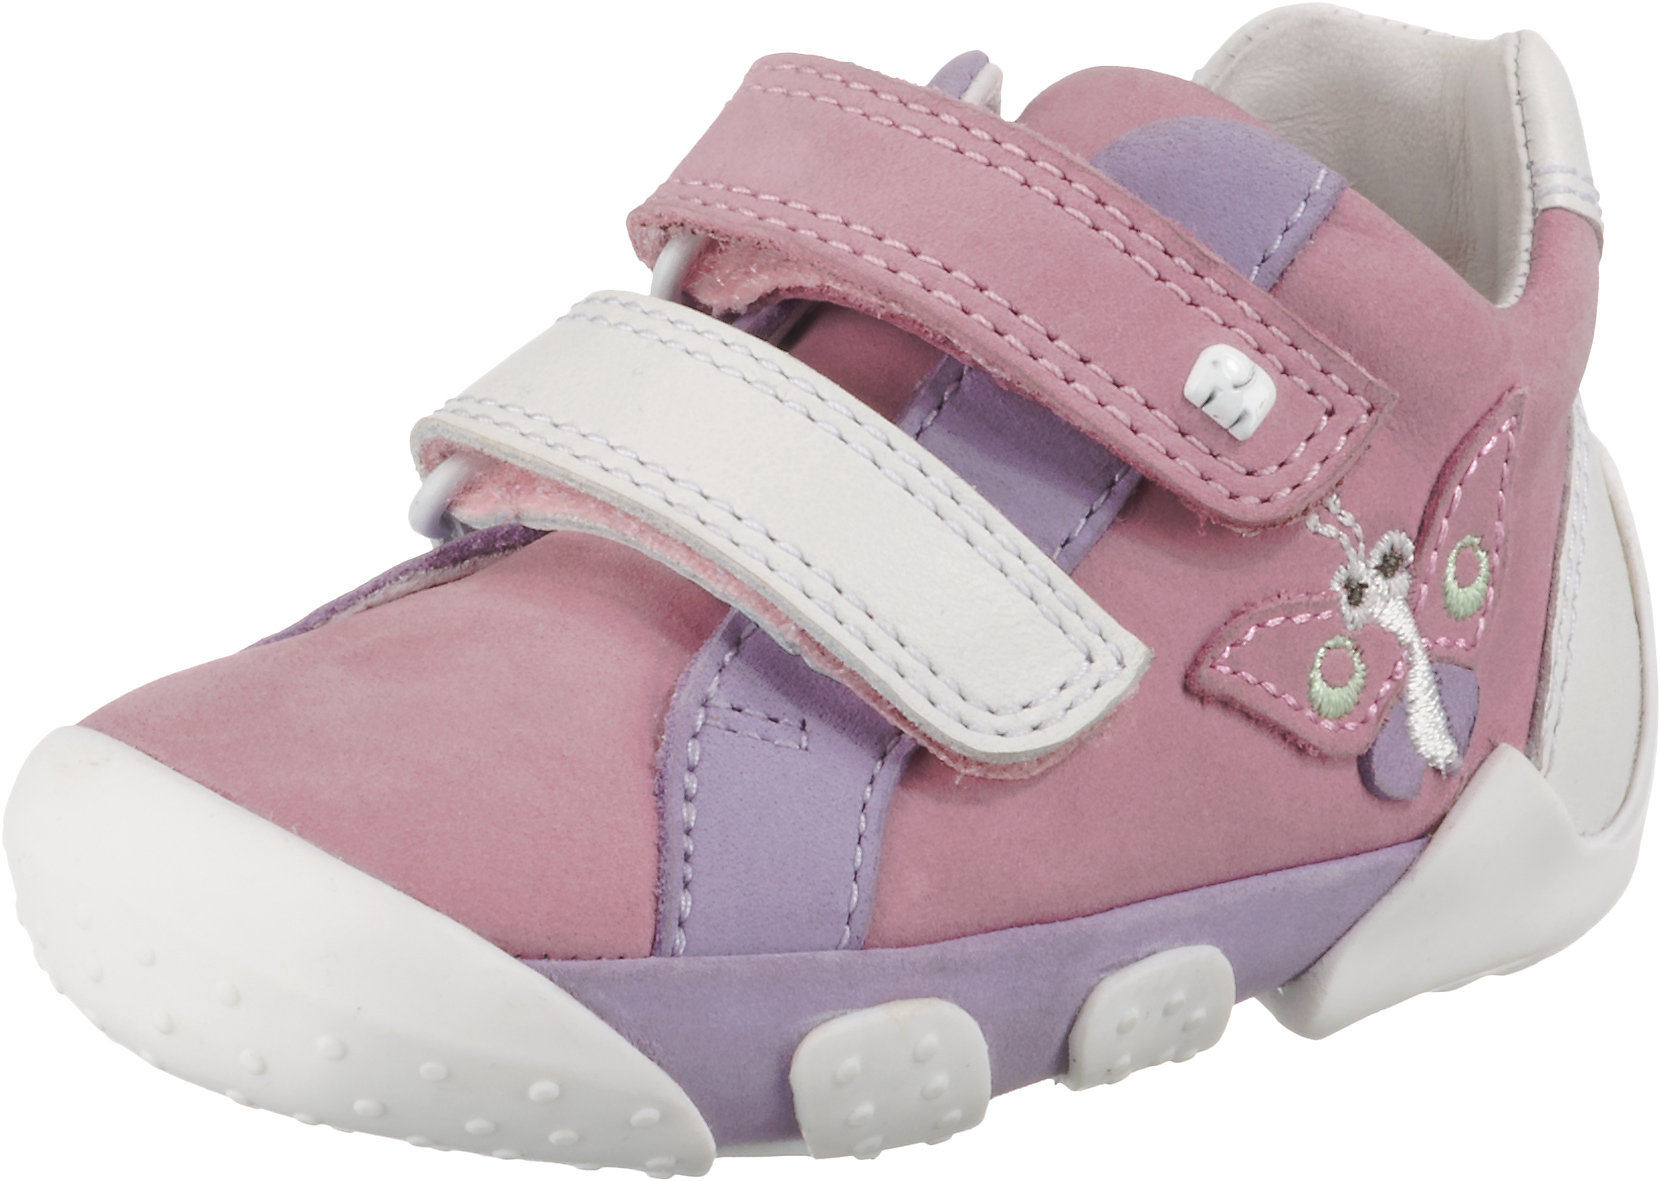 ELEFANTEN HALBSCHUHE LAUFLERNSCHUHE Schuhe BabyMädchen Gr